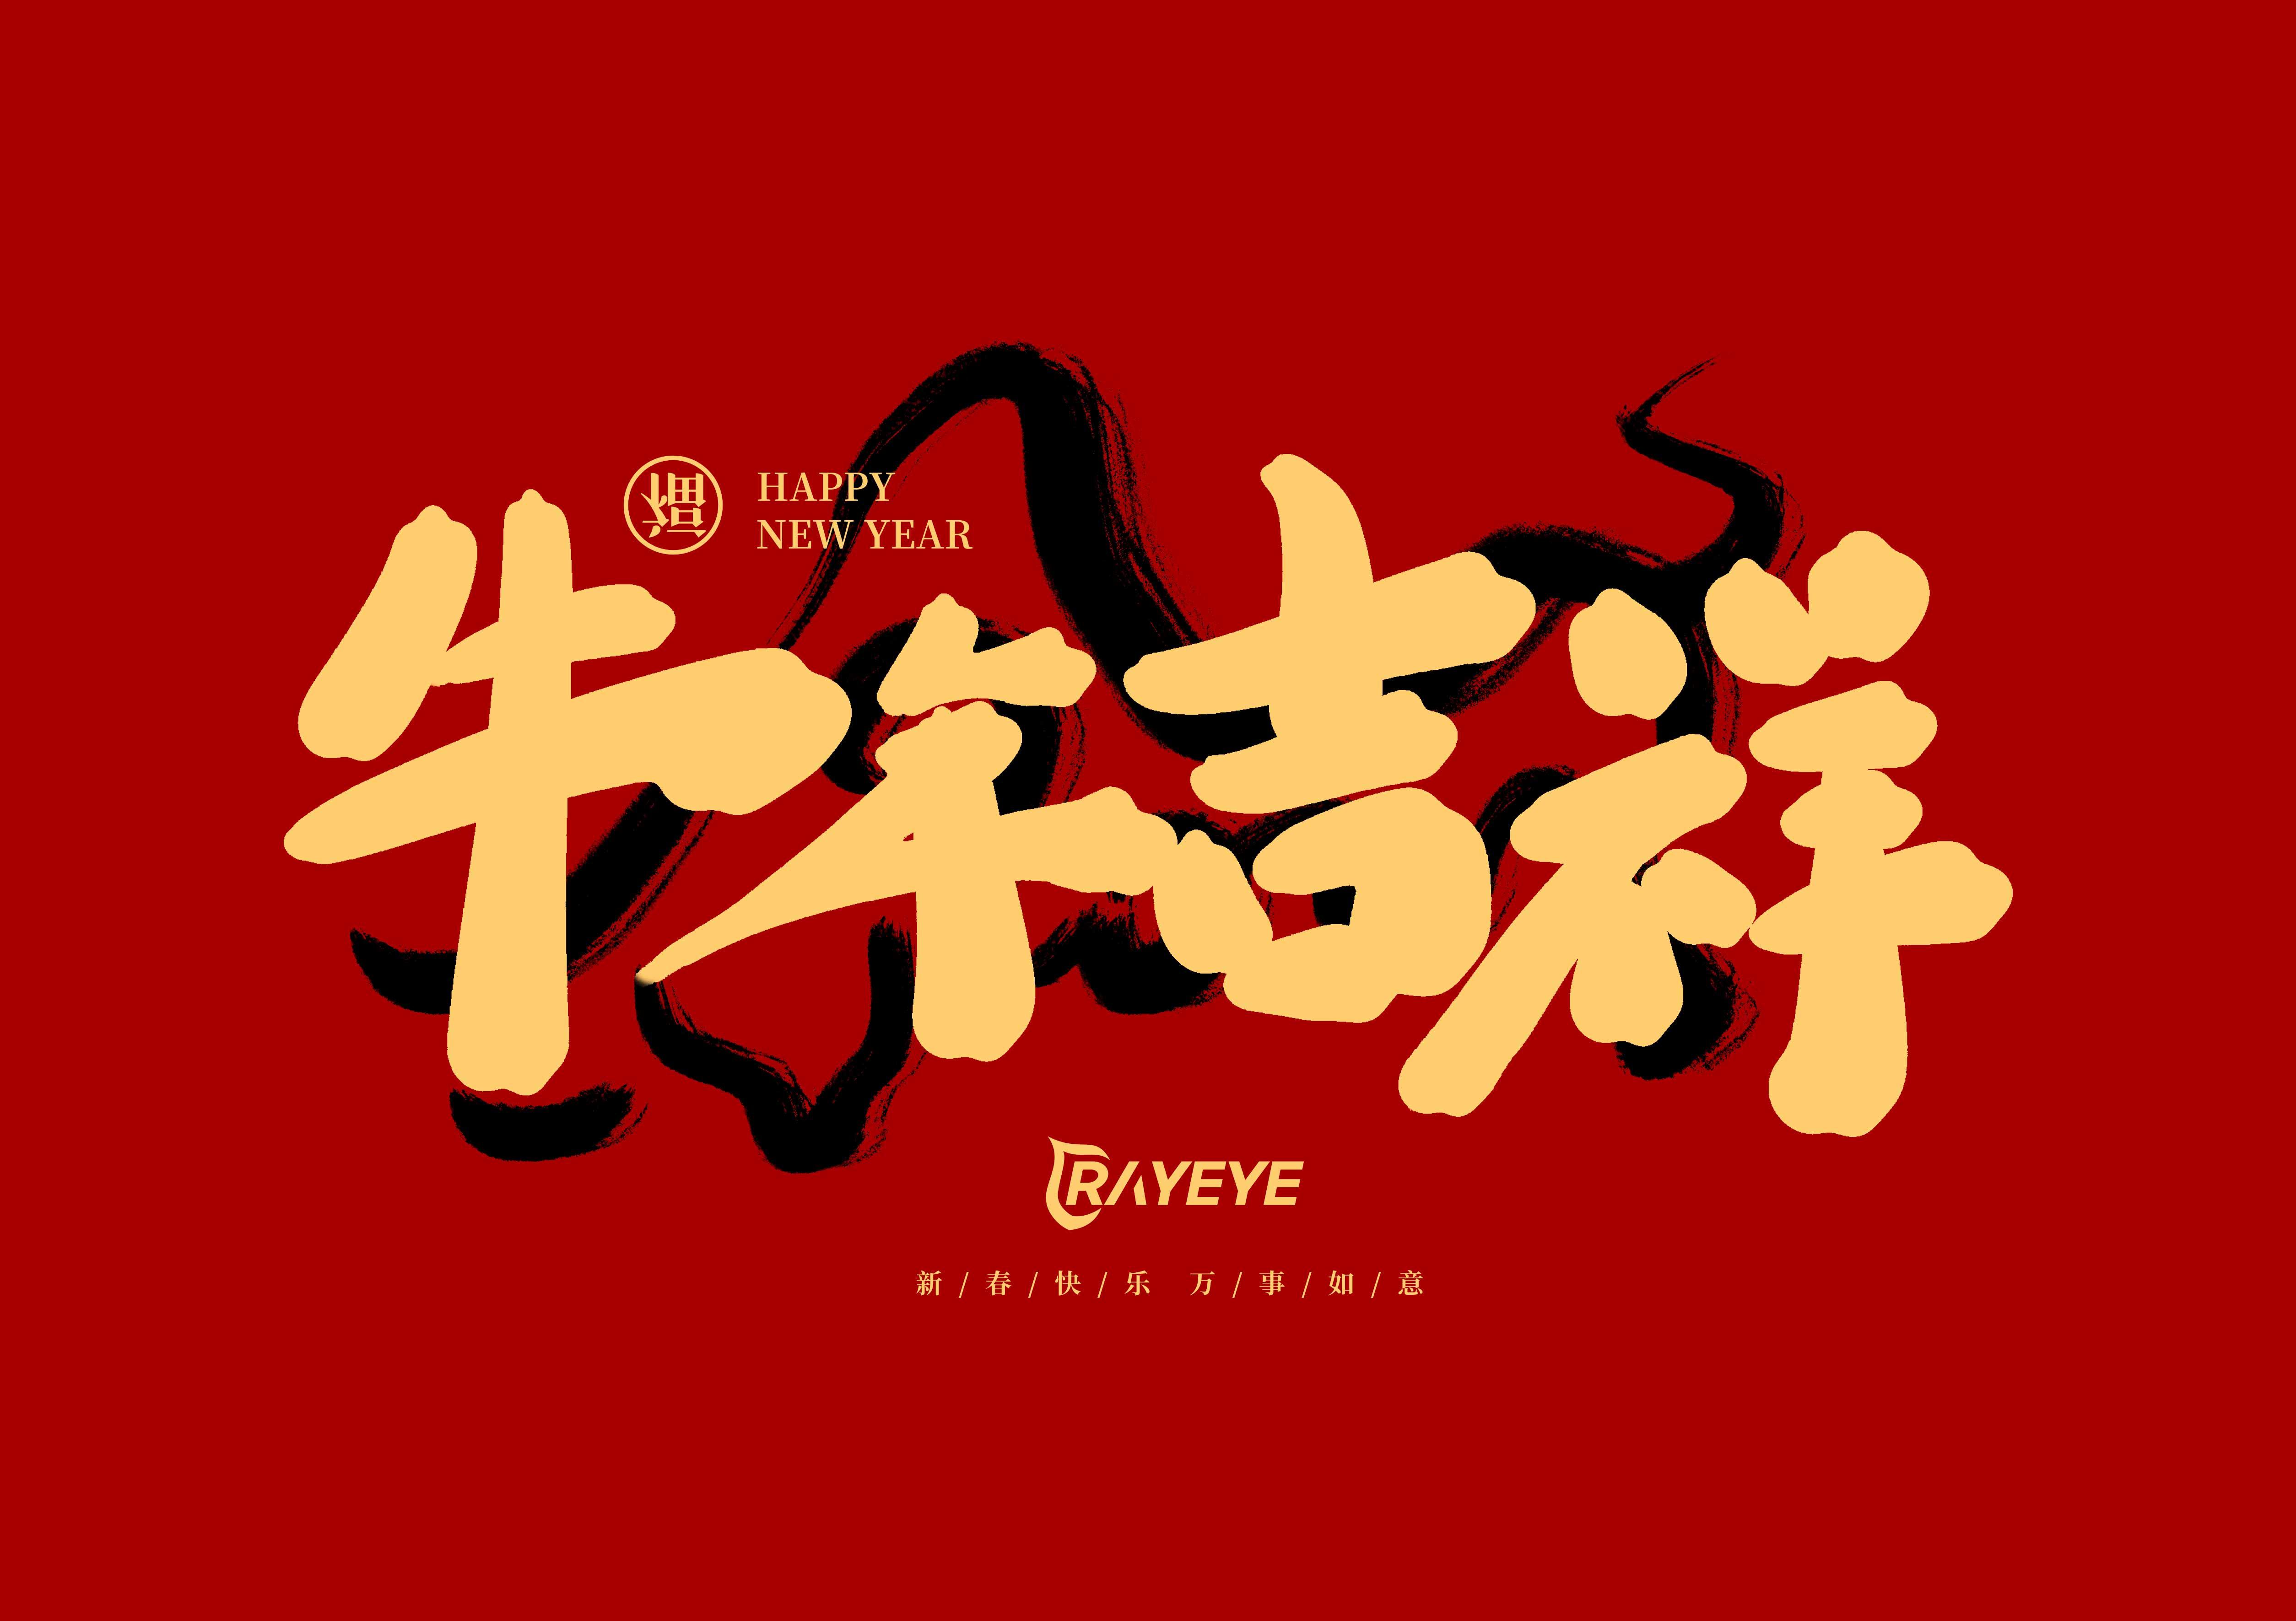 https://timcloud.oss-cn-shanghai.aliyuncs.com/file/iot4/picture/2021/2/9/1612856649091.jpg